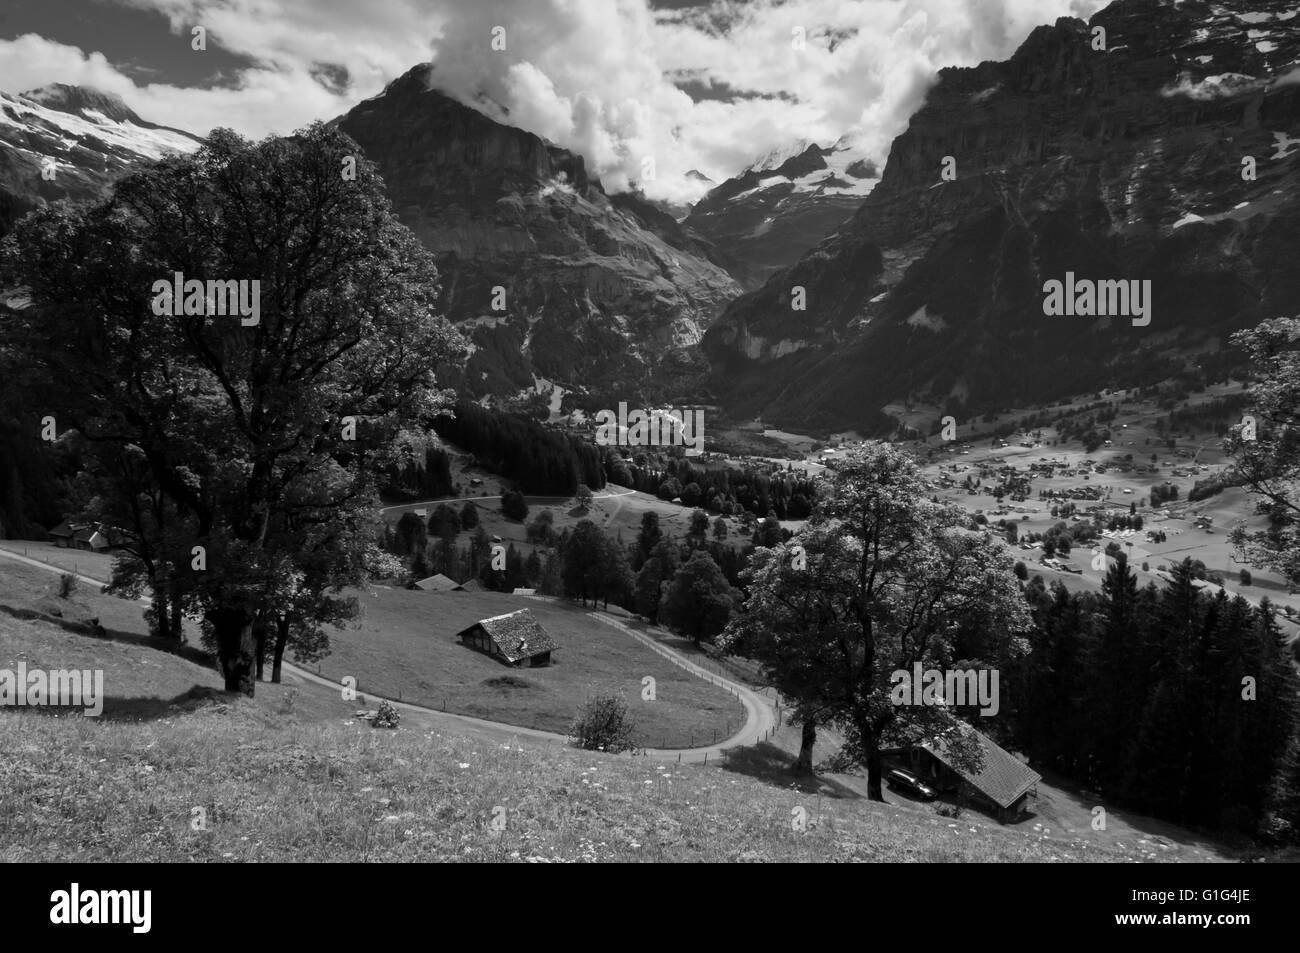 Summer in the Swiss mountains, Bernese Alps, Berner Oberland, Switzerland - Stock Image